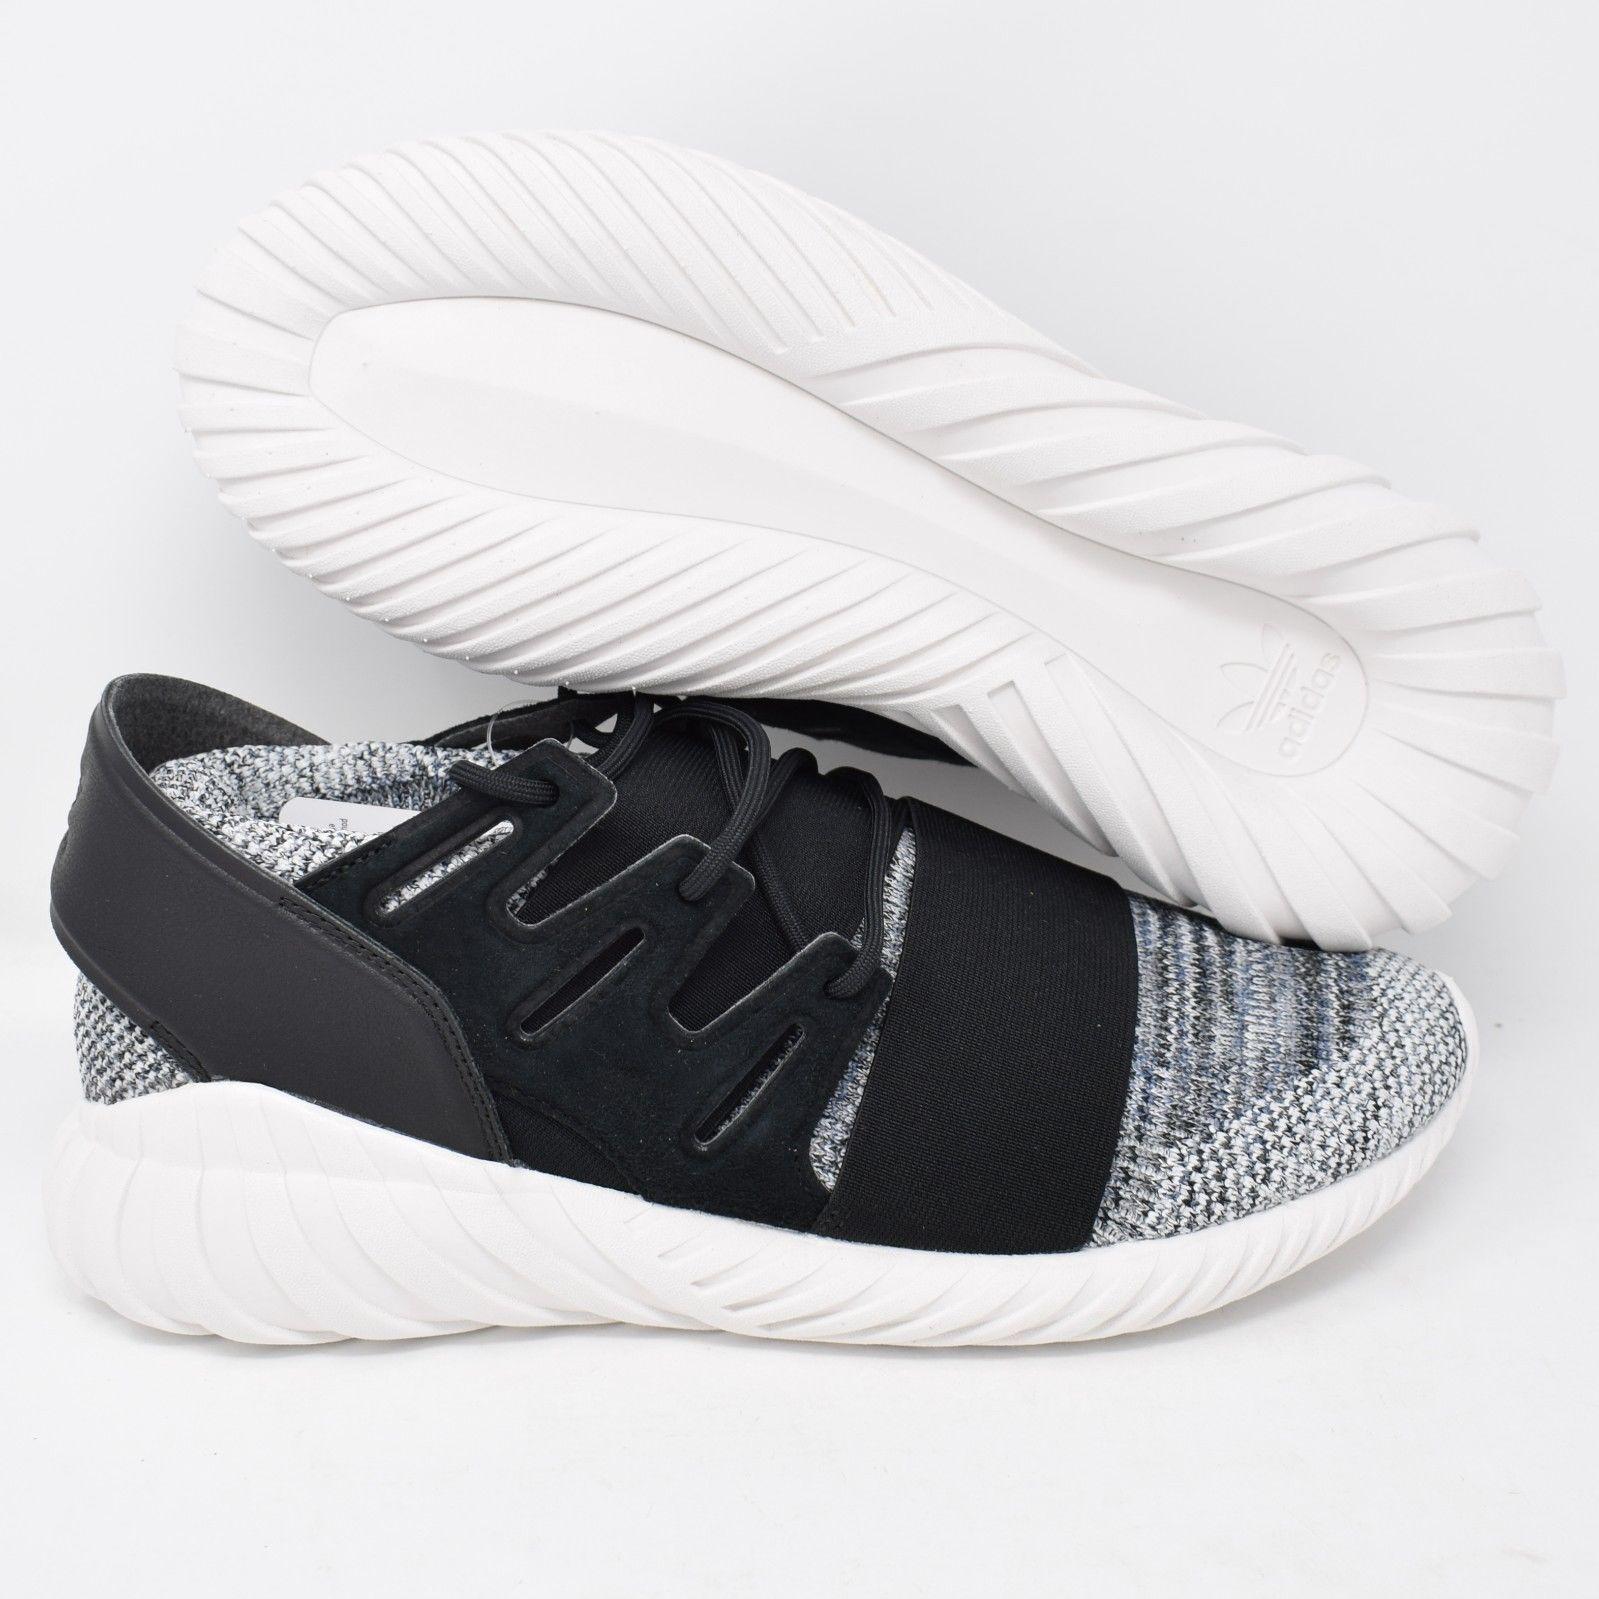 finest selection 57329 bb492 Adidas Tubular Tubular Tubular Doom PK BY3550 Mens shoes Primeknit Originals  Black   White fc63c4